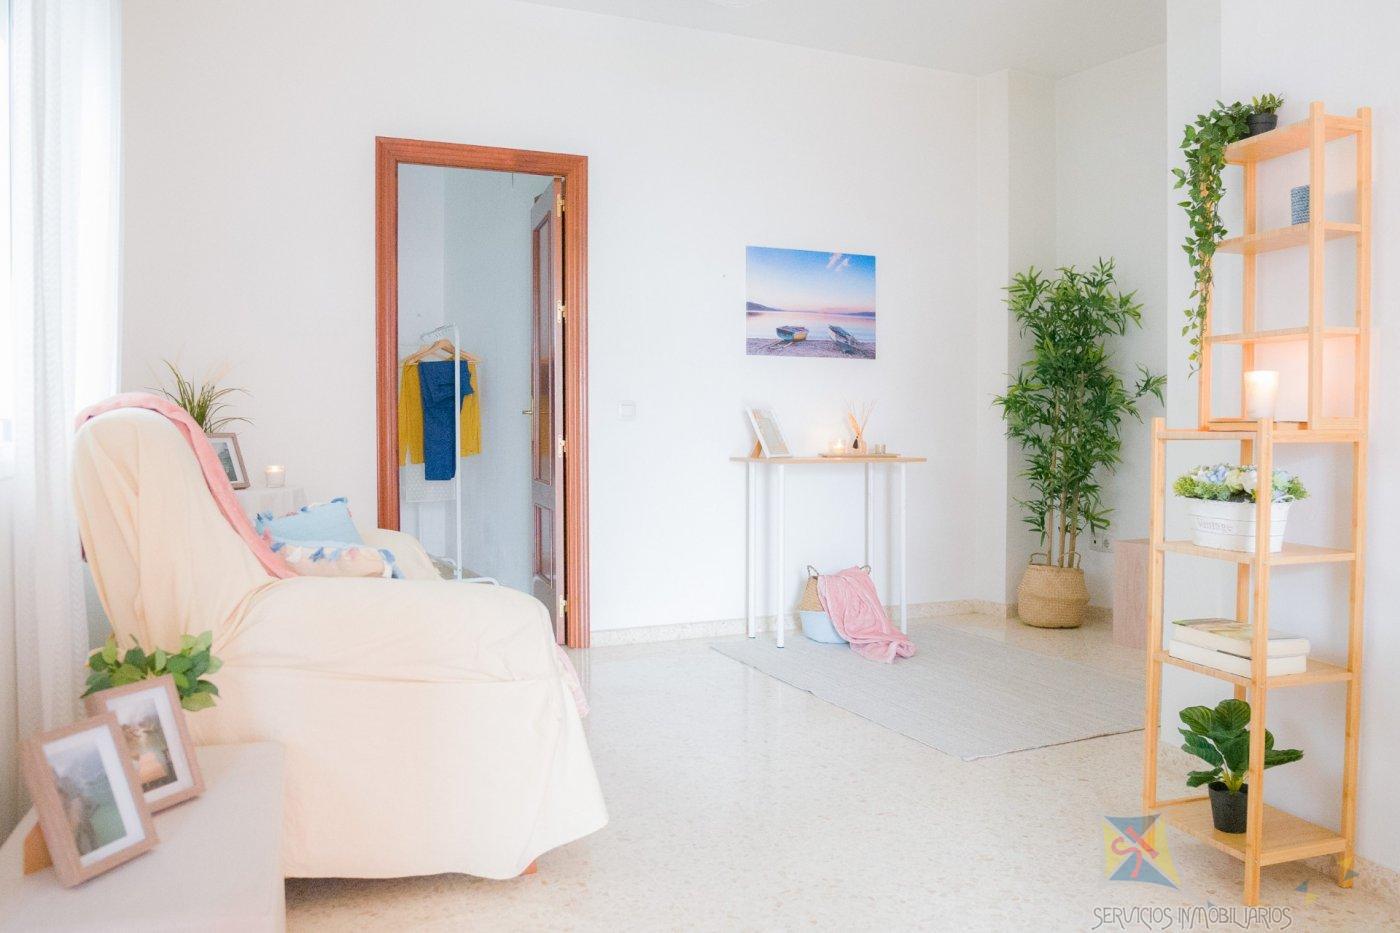 Venta de apartamento en Alcalá de Guadaíra